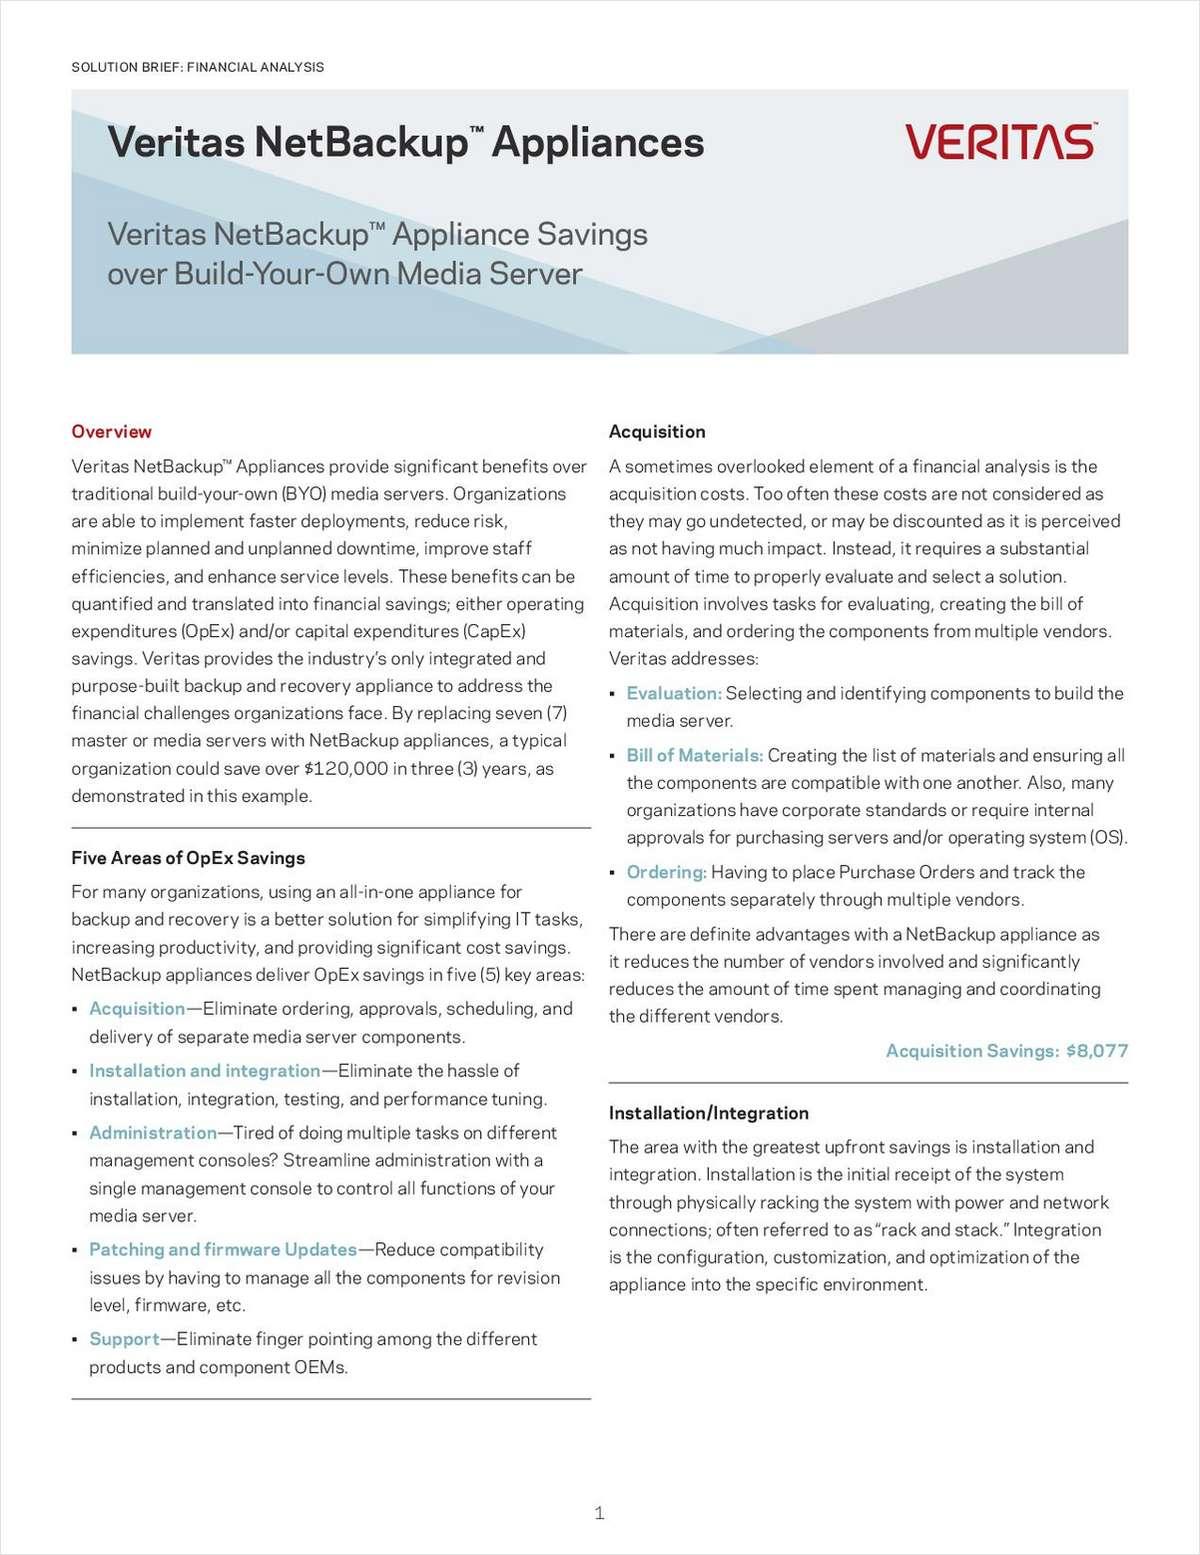 Veritas NetBackup Appliance Savings over Build Your Own Media Server